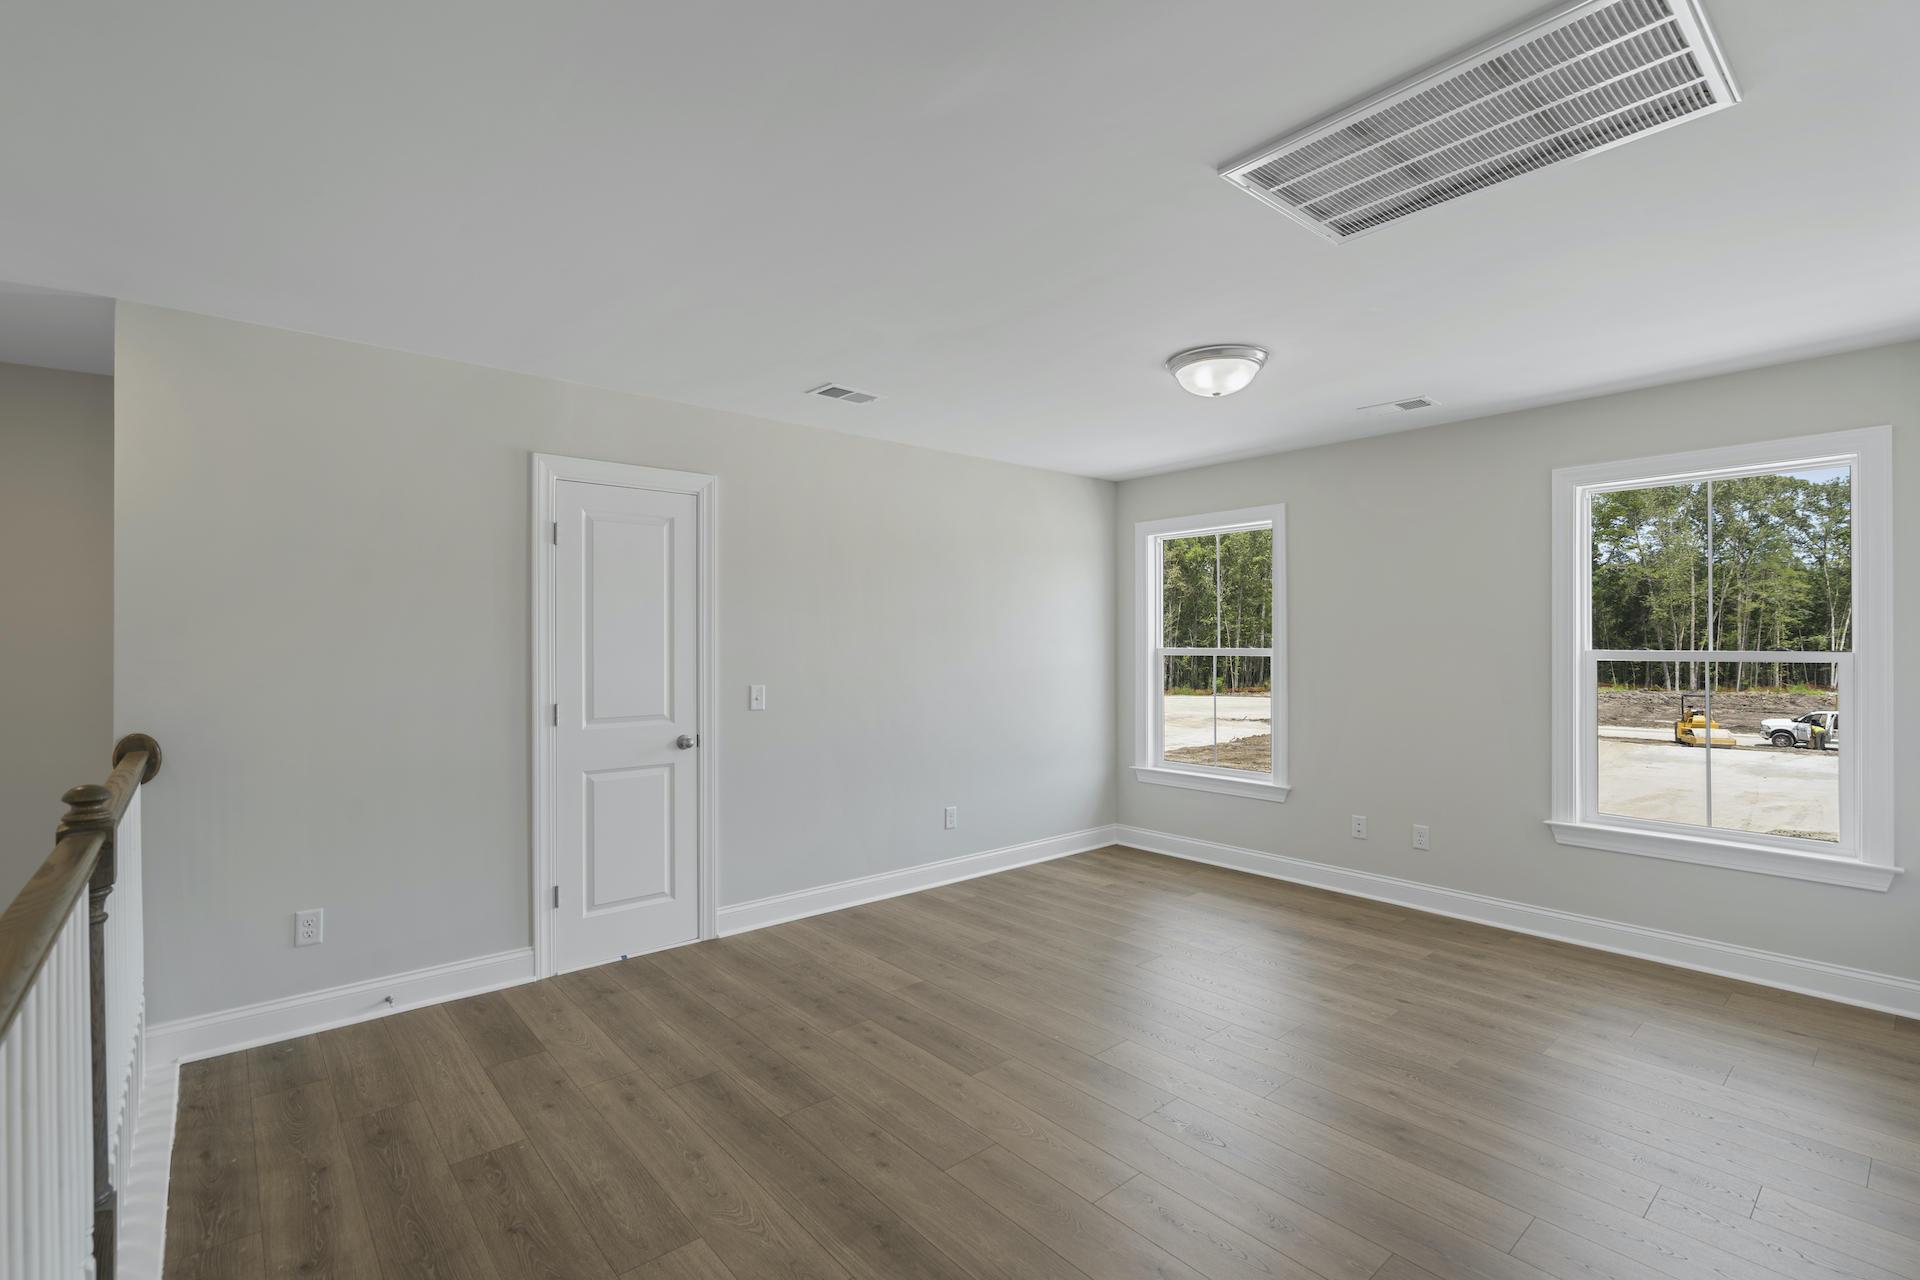 Drayton Oaks Homes For Sale - 105 Plowden Mill, Summerville, SC - 9